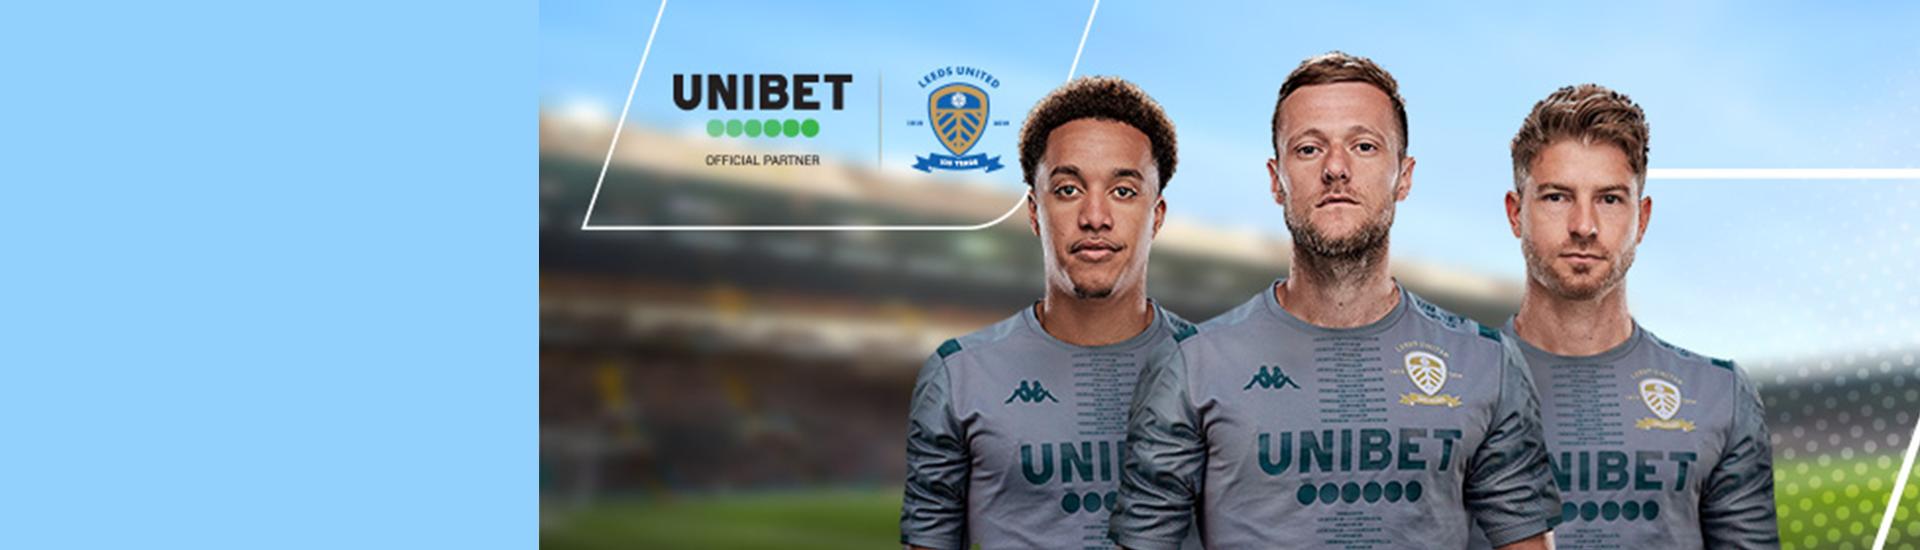 Win VIP hospitality with UniBet's Golden Goal Predictor